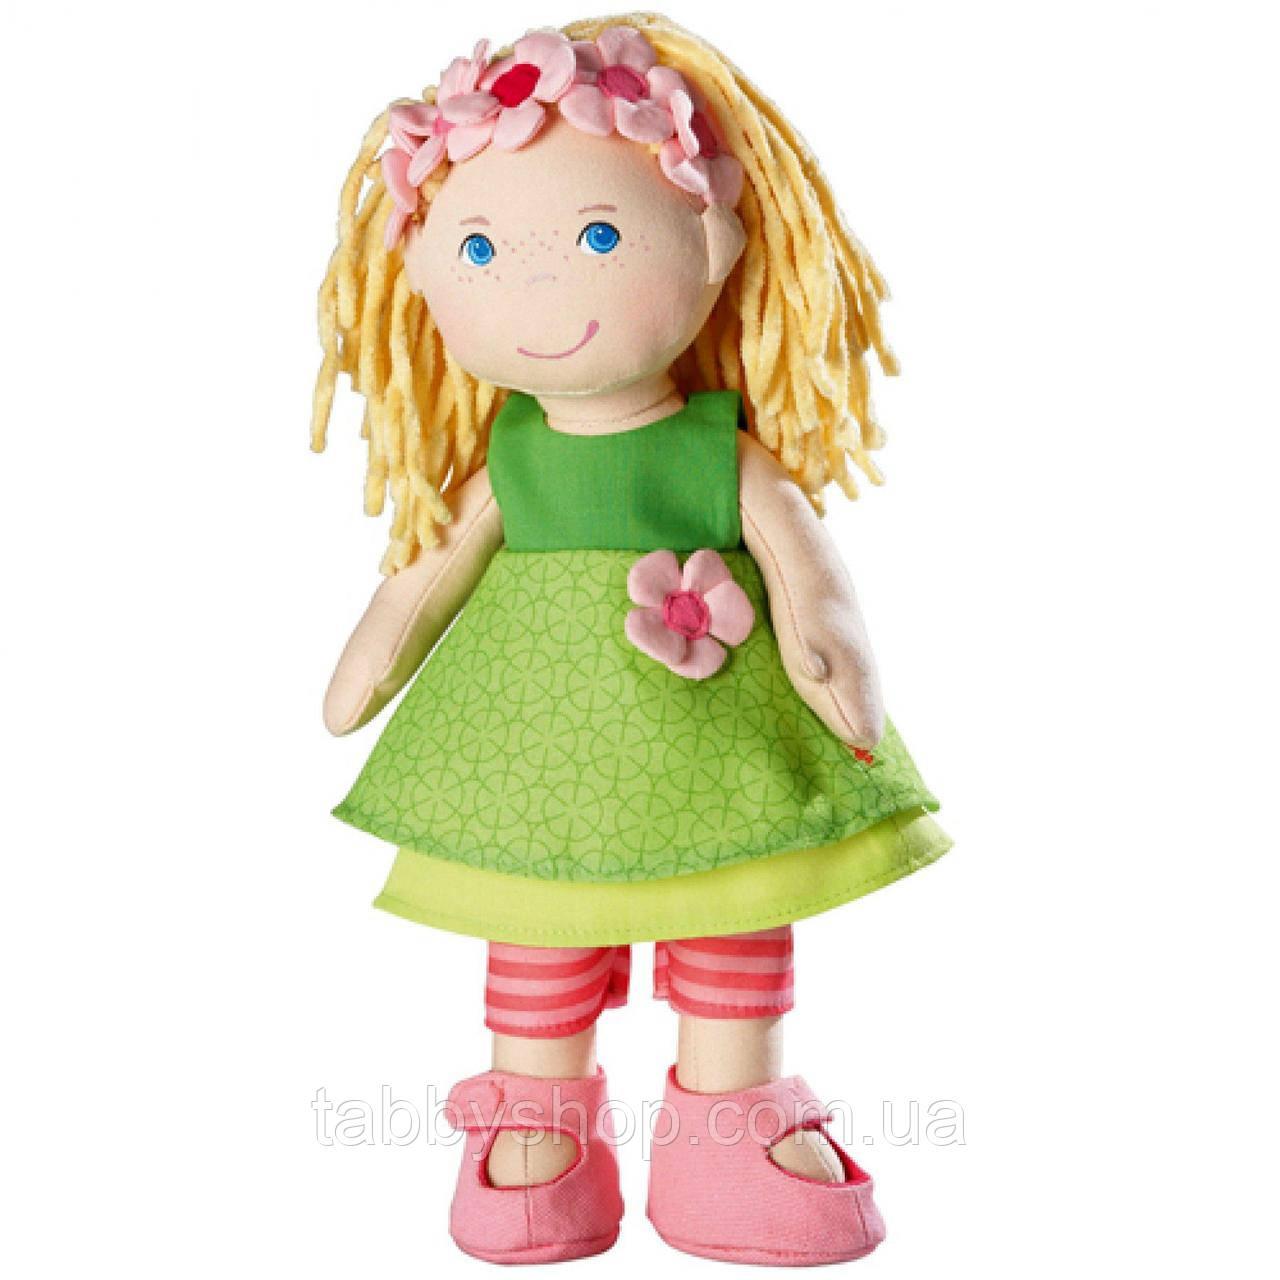 "Кукла мягкая HABA ""Мали"""